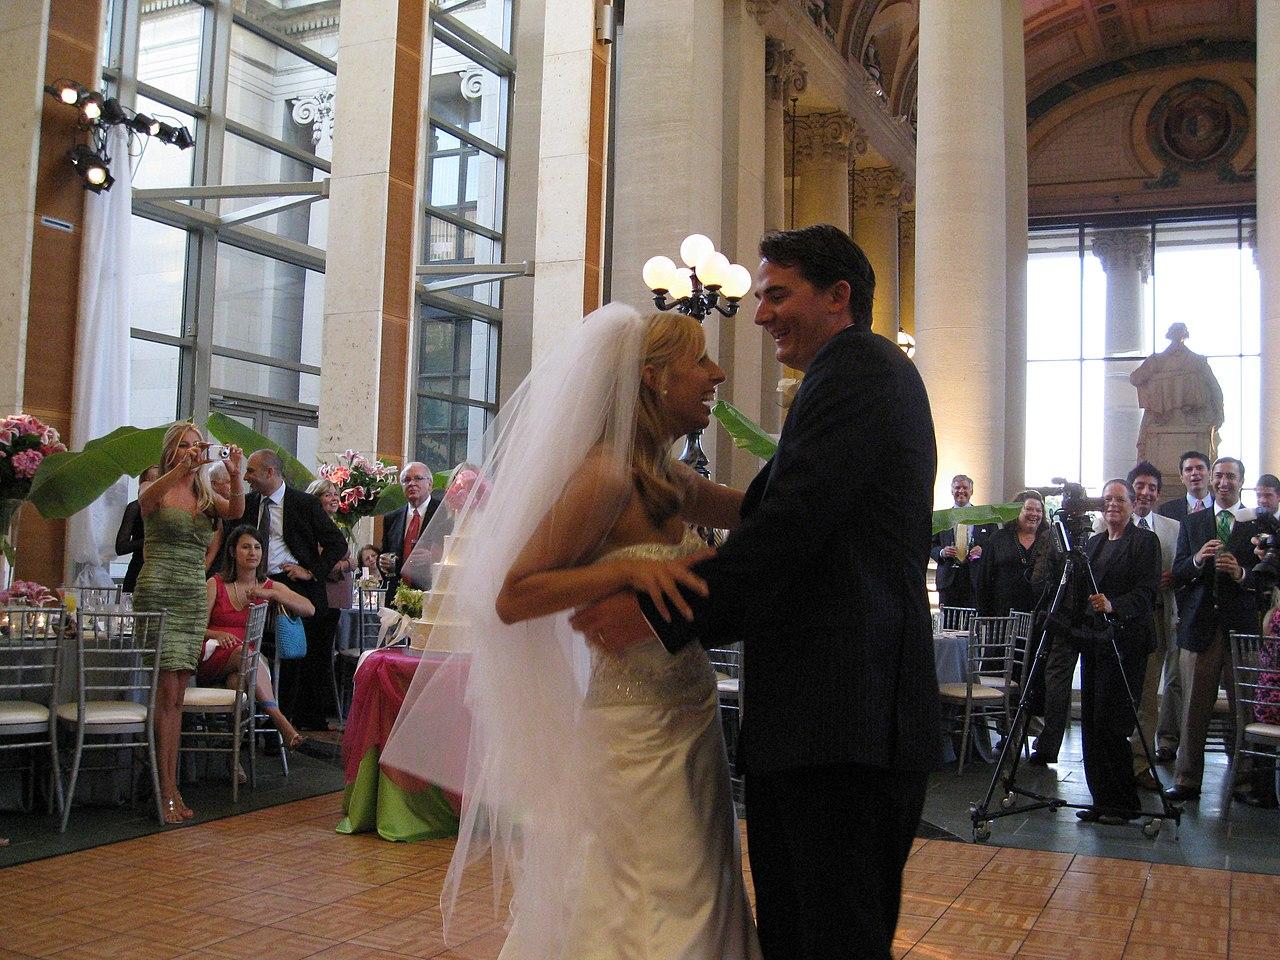 File:Marriage in Missouri History Museum.jpg - Wikimedia Commons